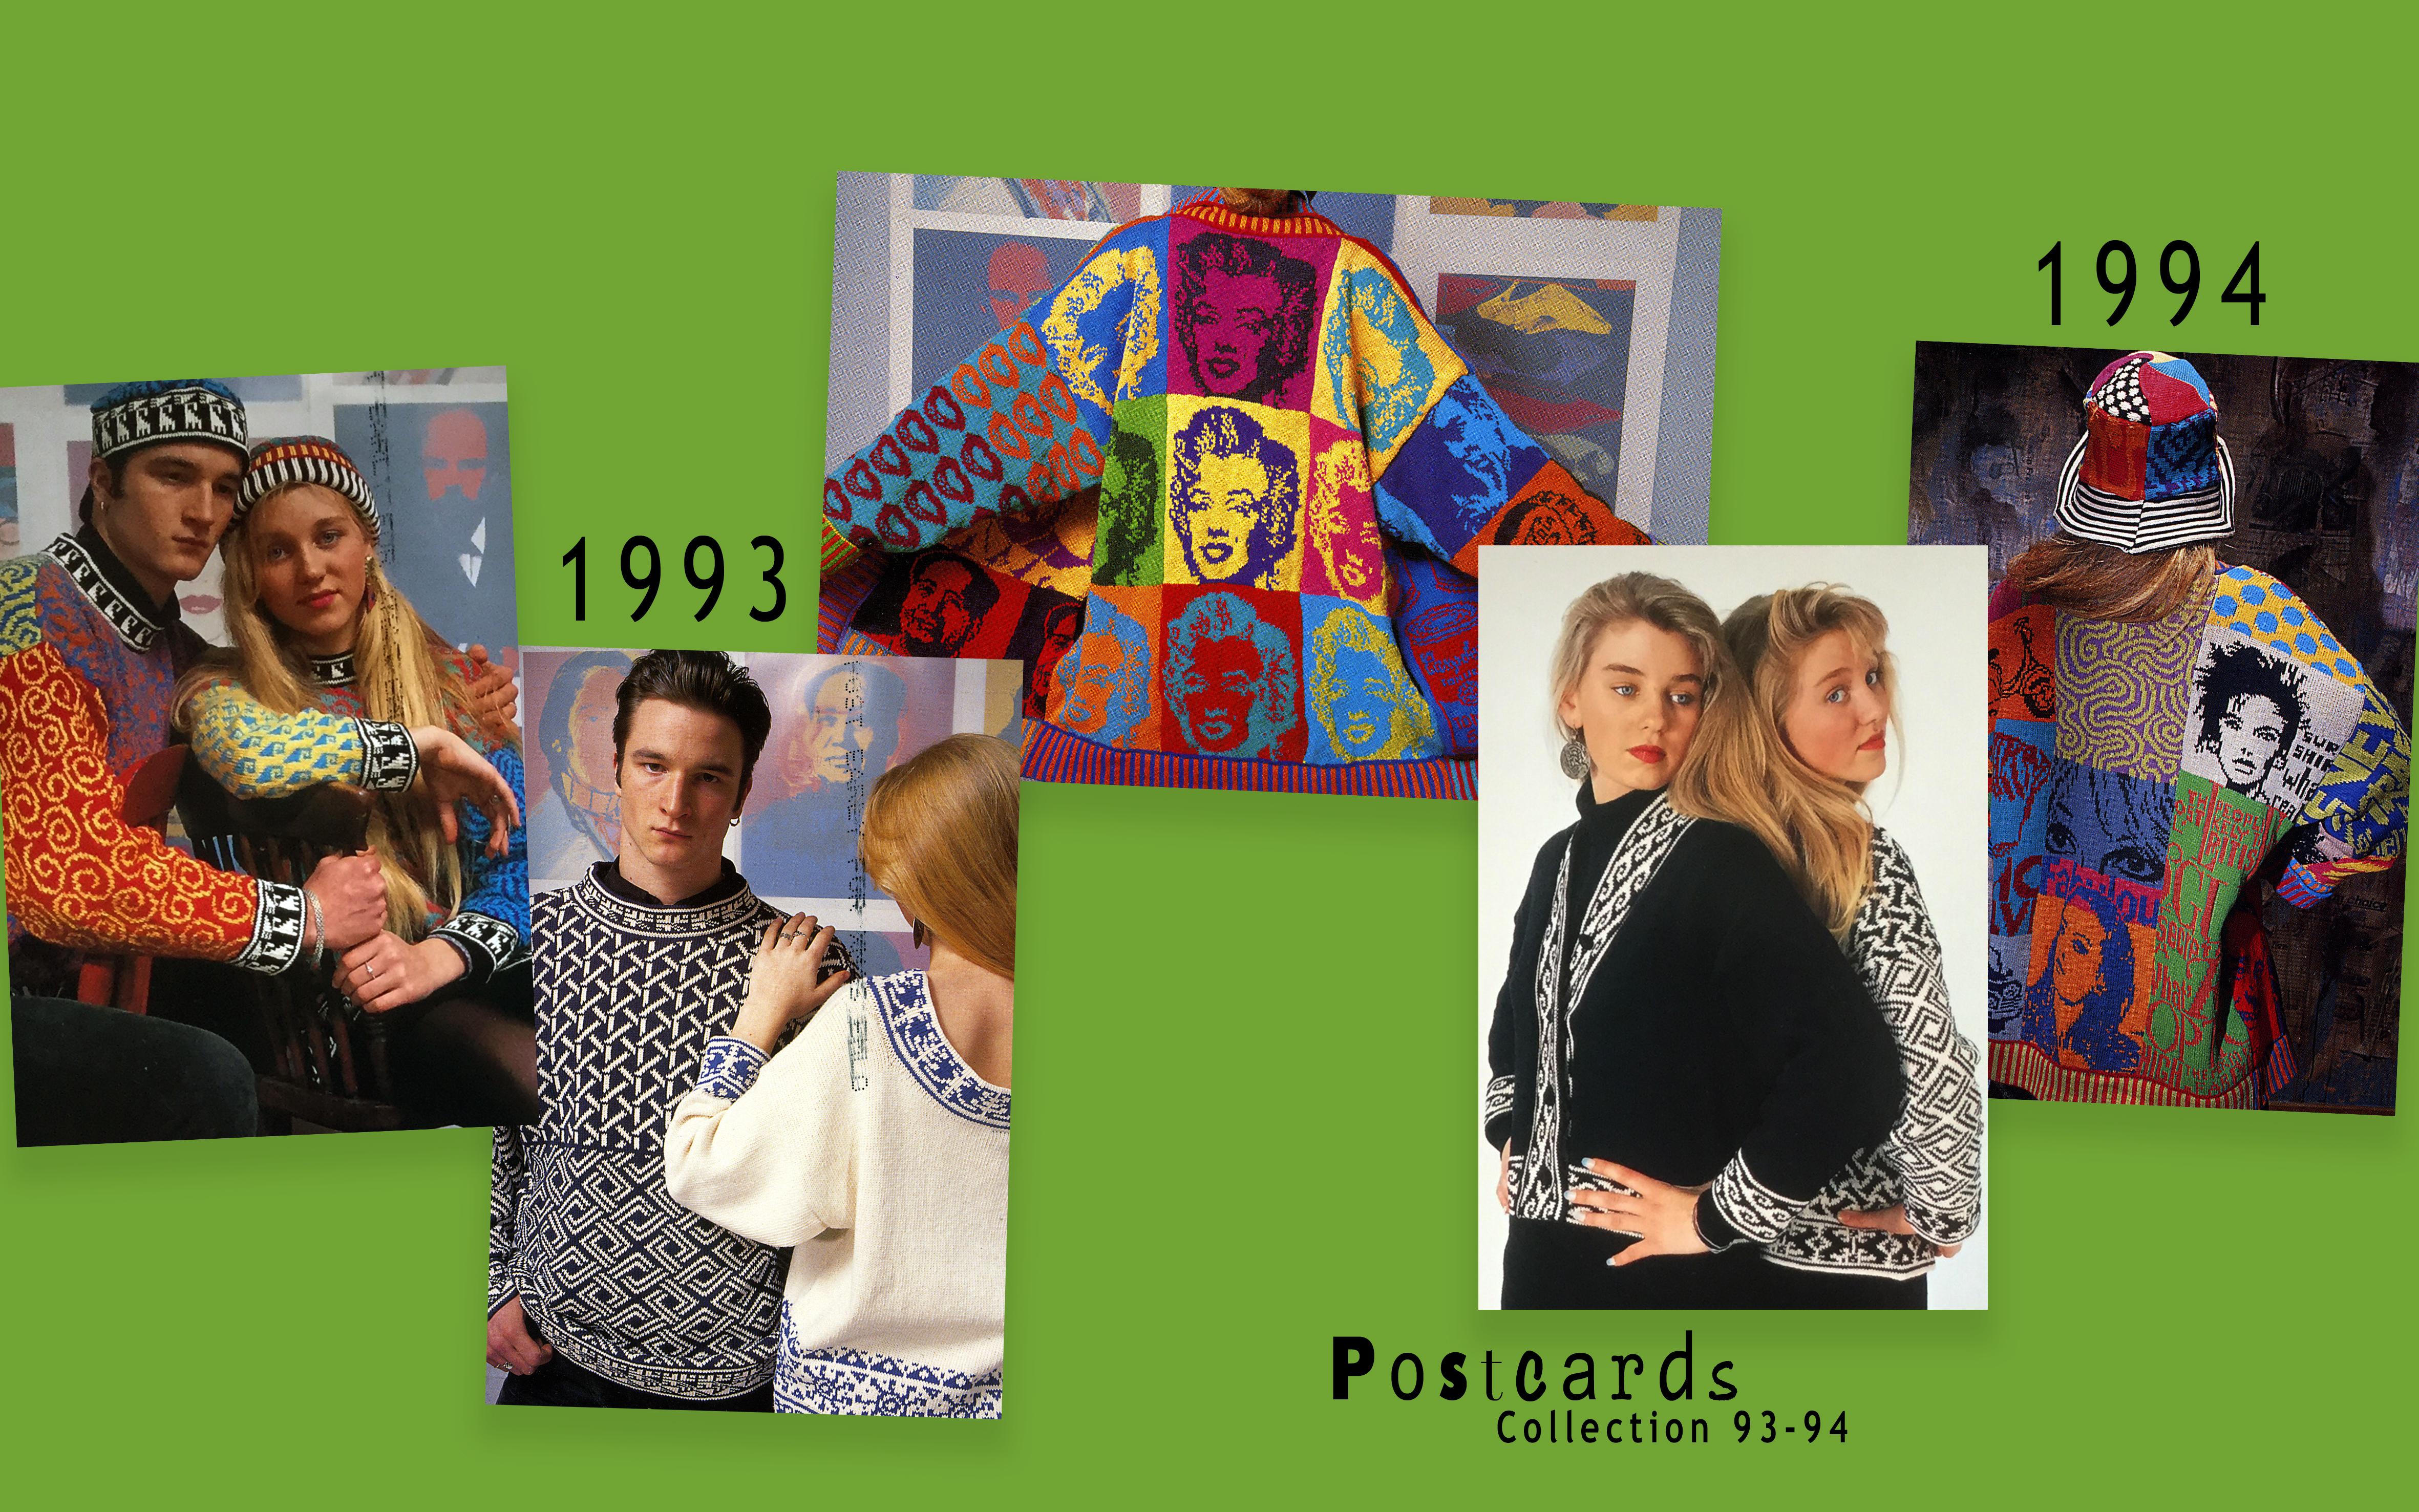 1993 -1994